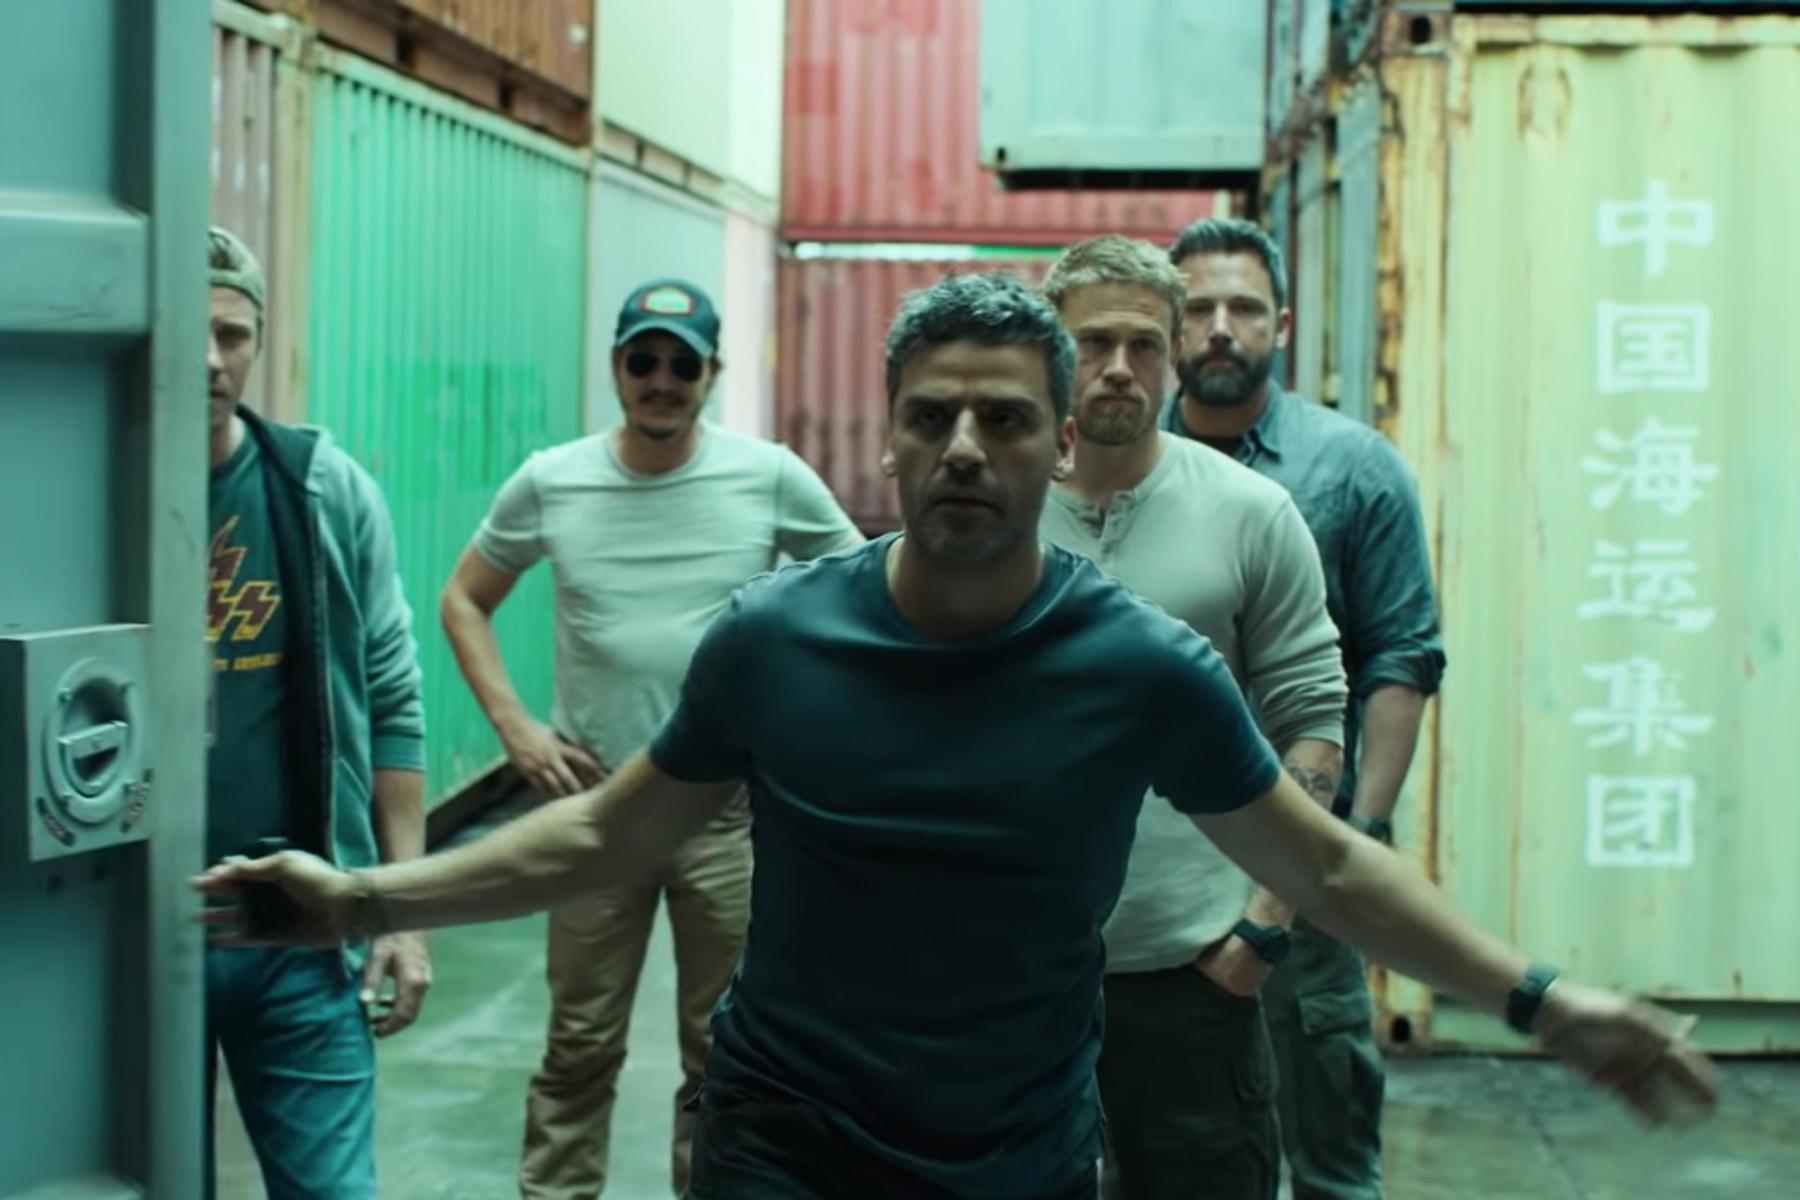 5bf48631 Netflix: Watch Ben Affleck, Oscar Isaac in 'Triple Frontier' Trailer –  Rolling Stone